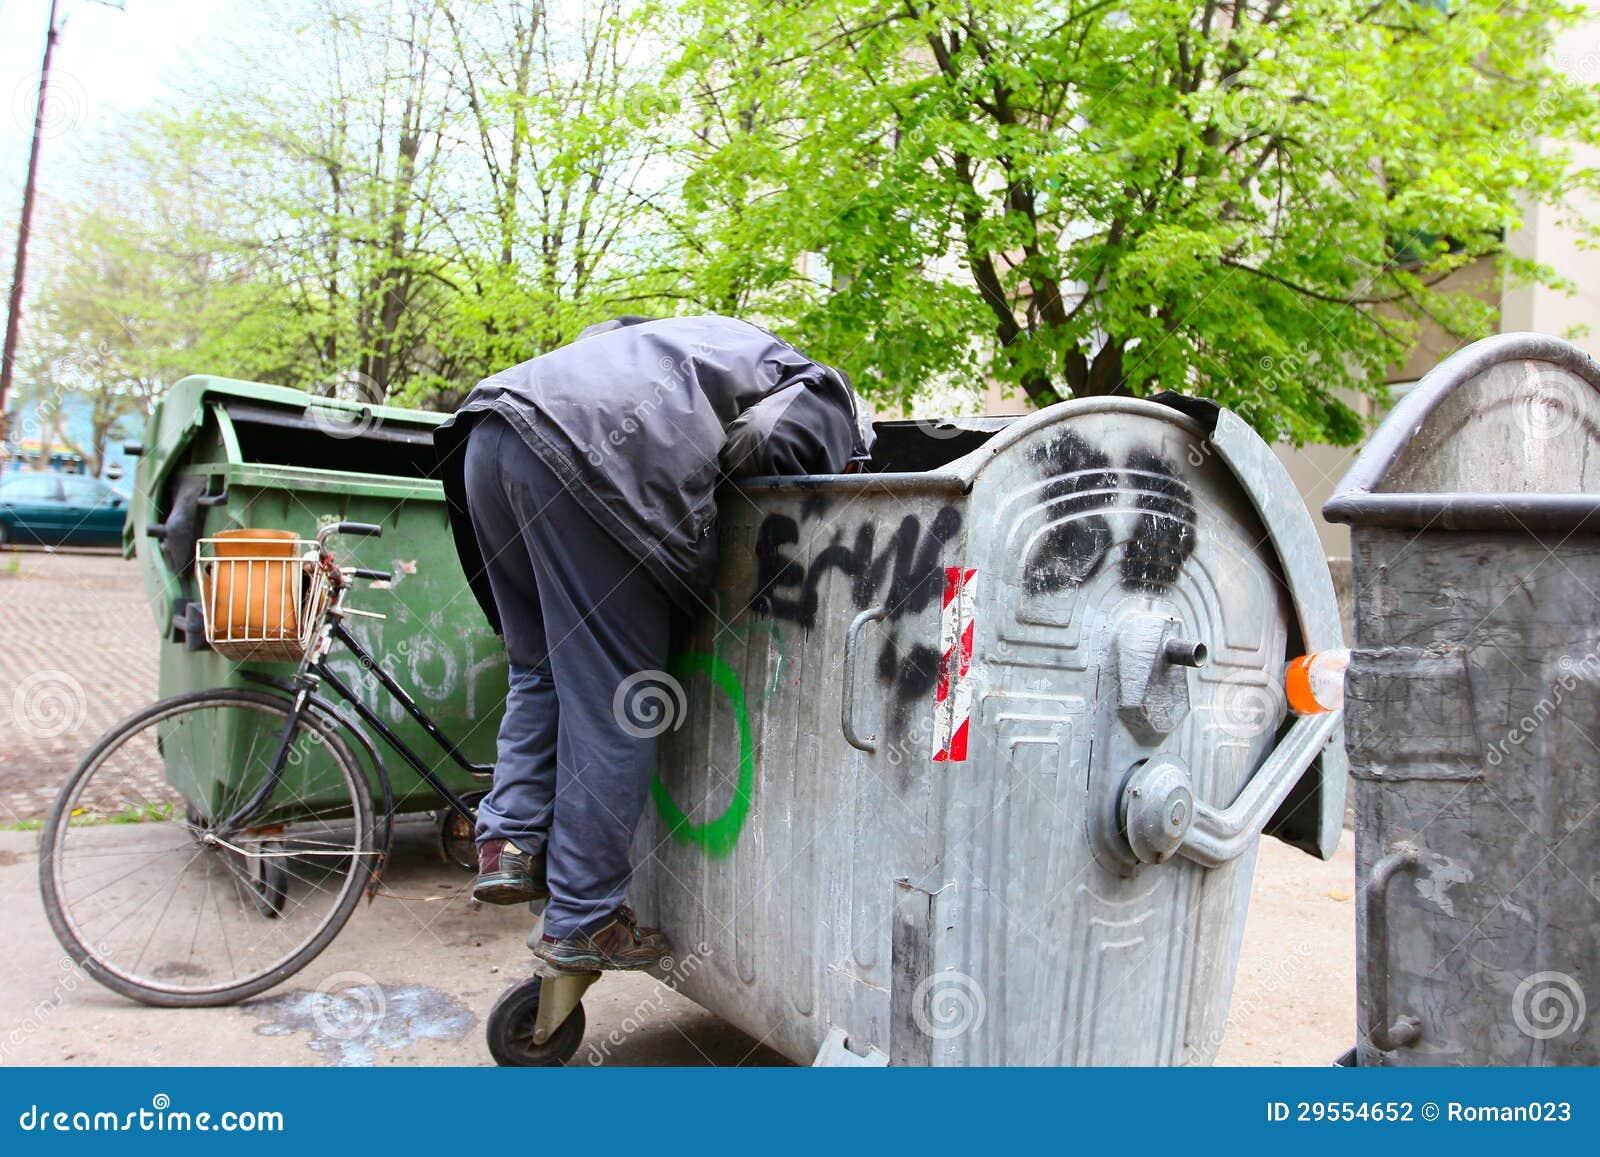 Urban Poverty Stock Photography - Image: 29554652